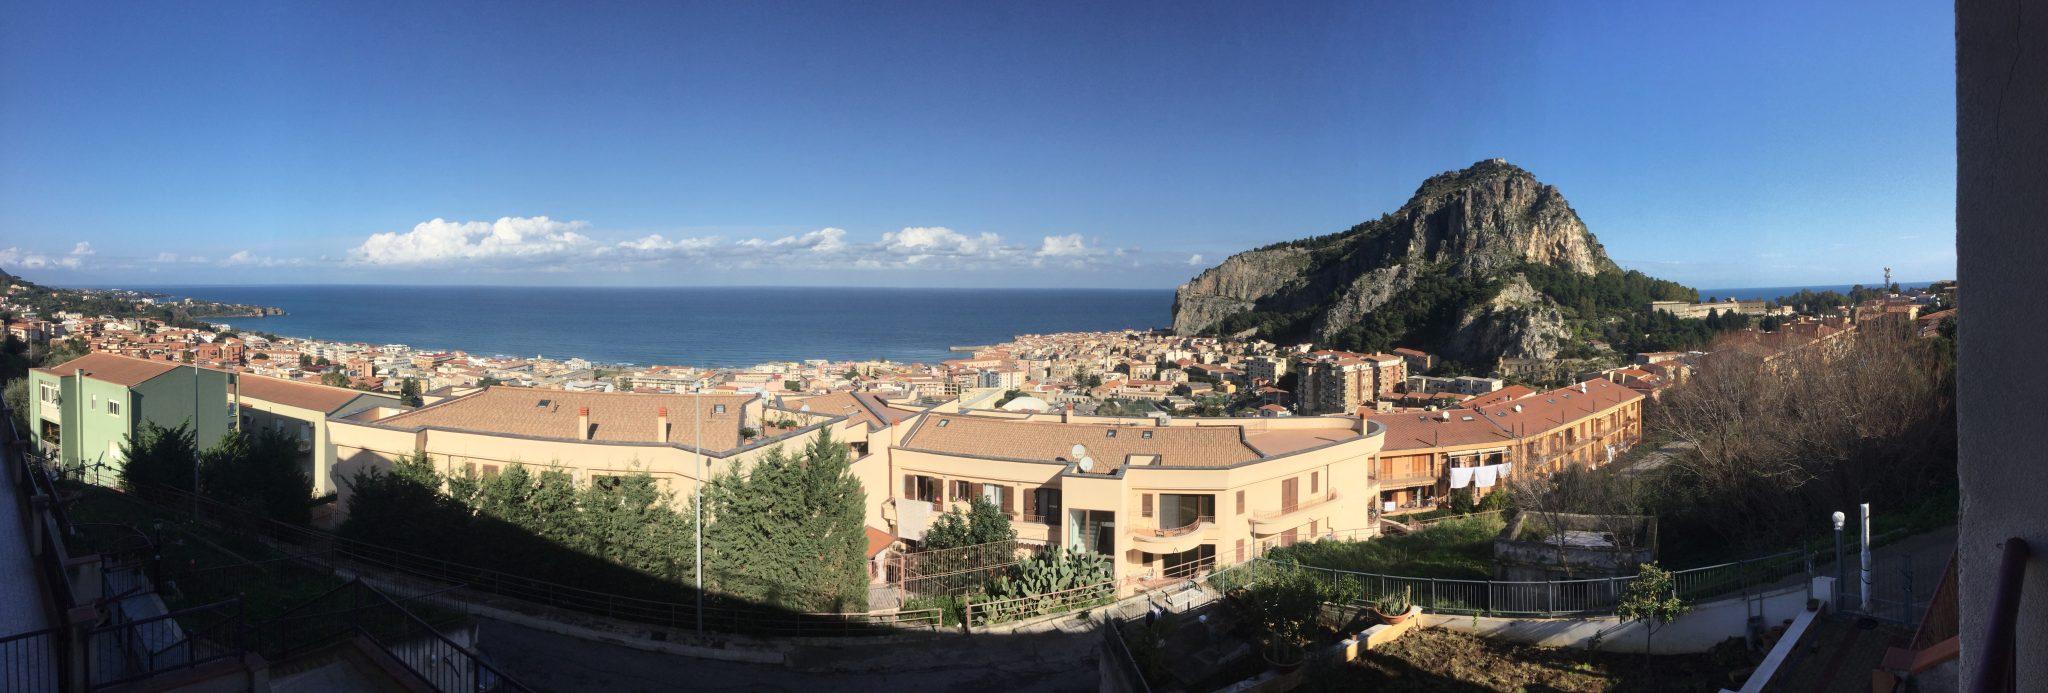 109  - Appartamento panoramico in via Giubileo Magno, Cefalù.